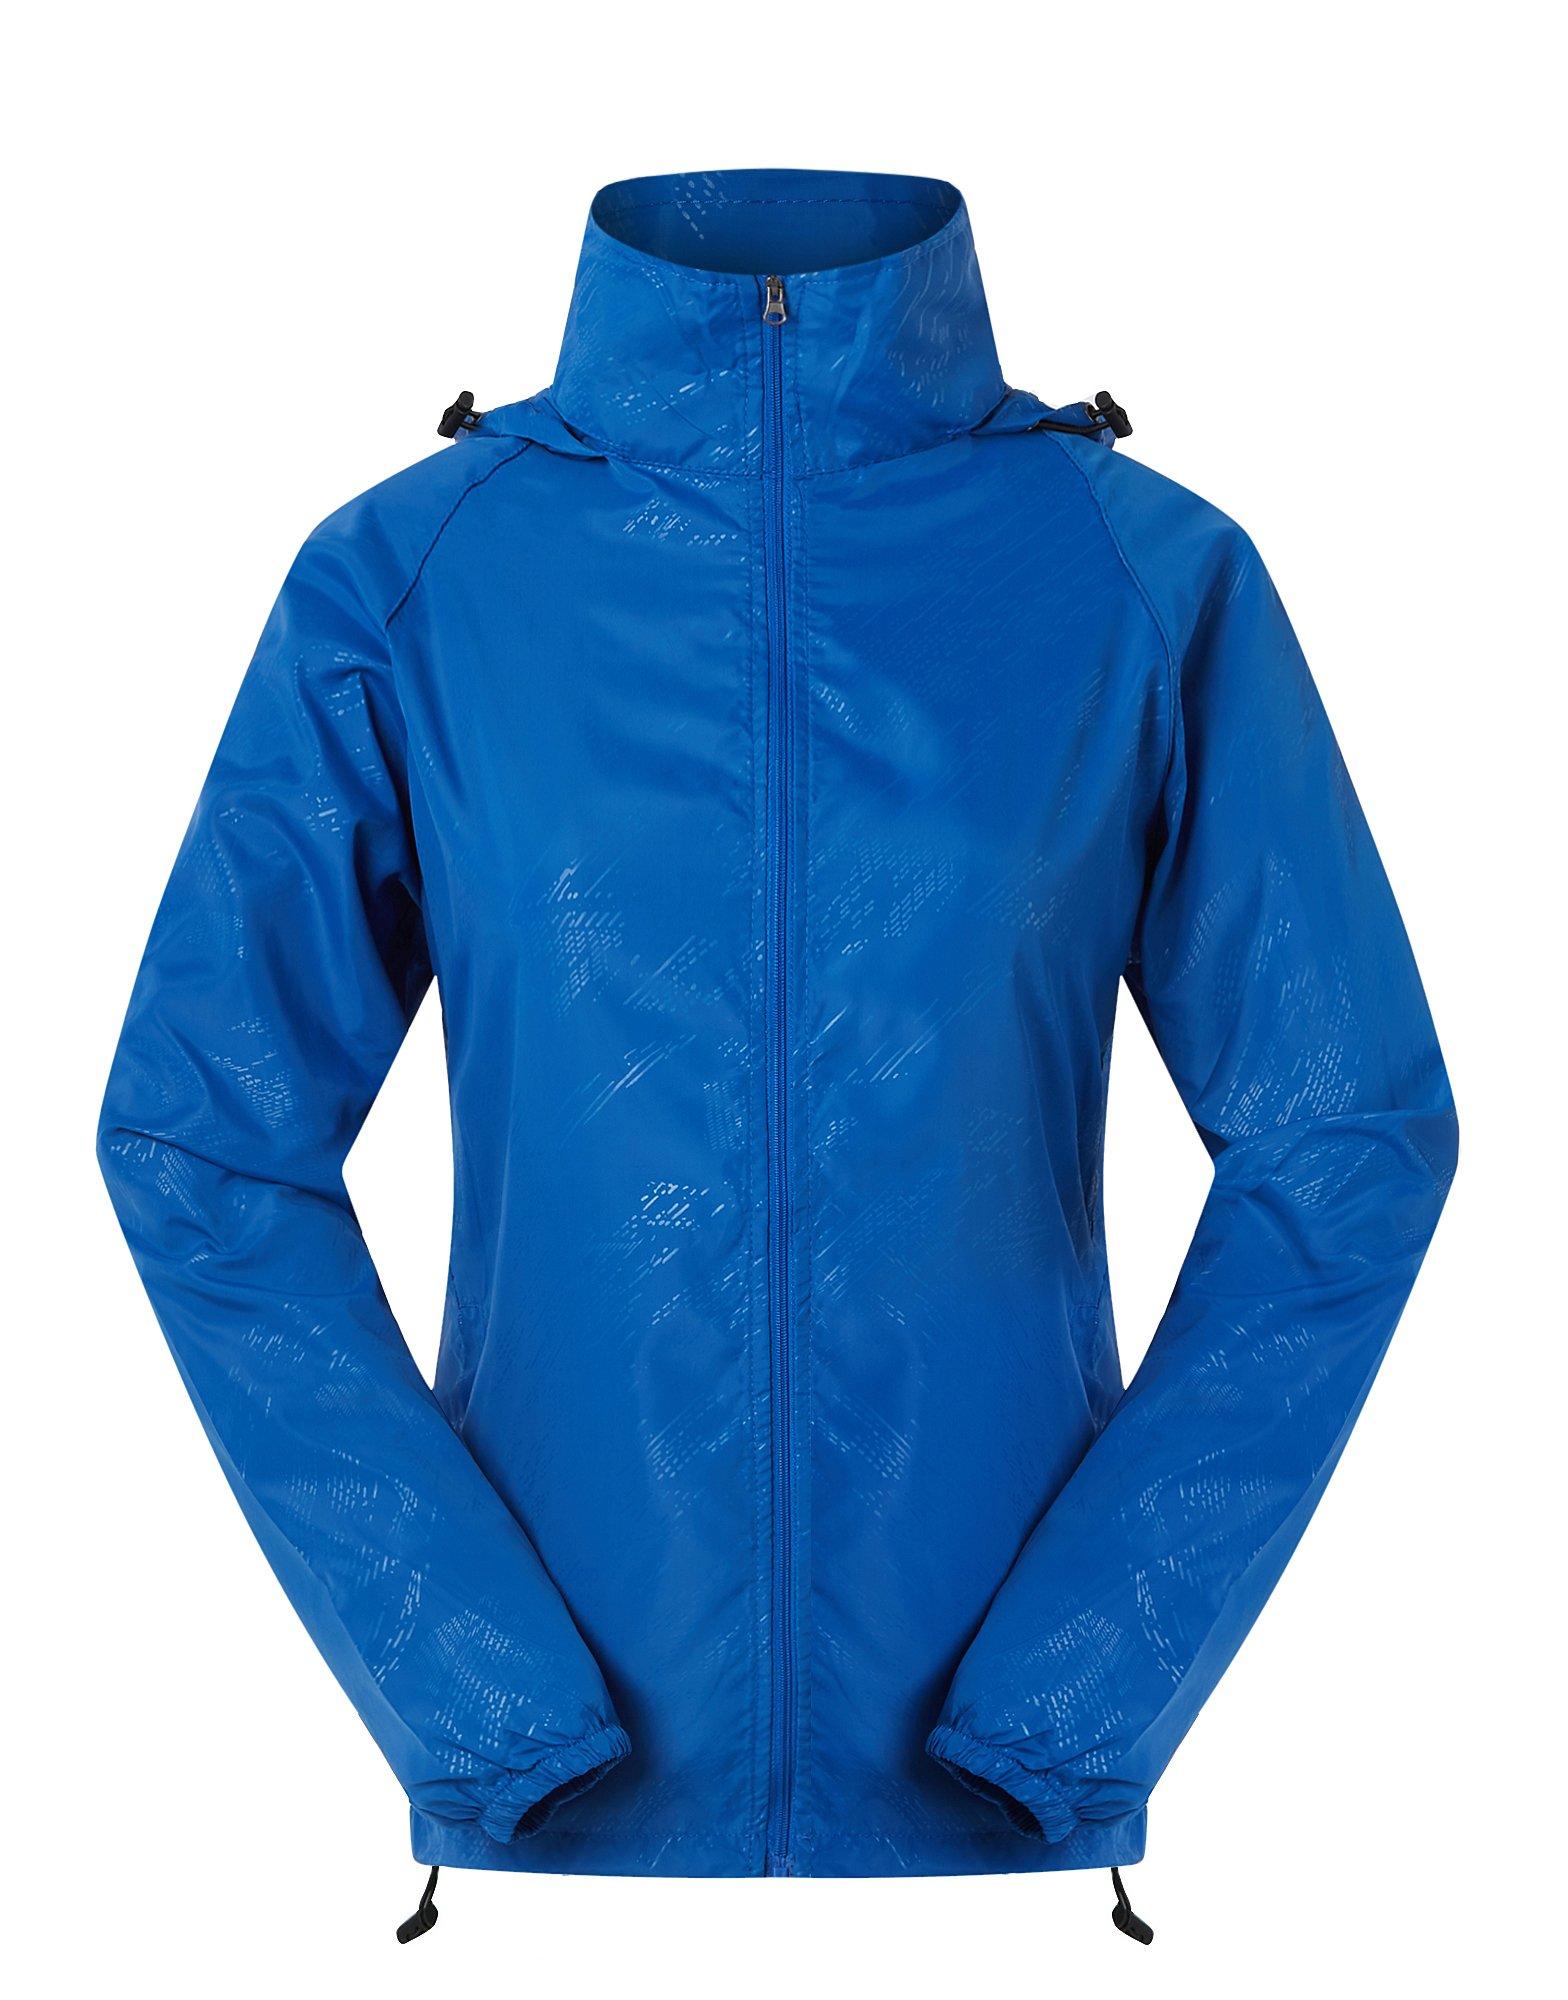 Cheering Spmor Women's Lightweight Jackets Waterproof Windbreaker Jacket UV Protect Running Coat S Blue